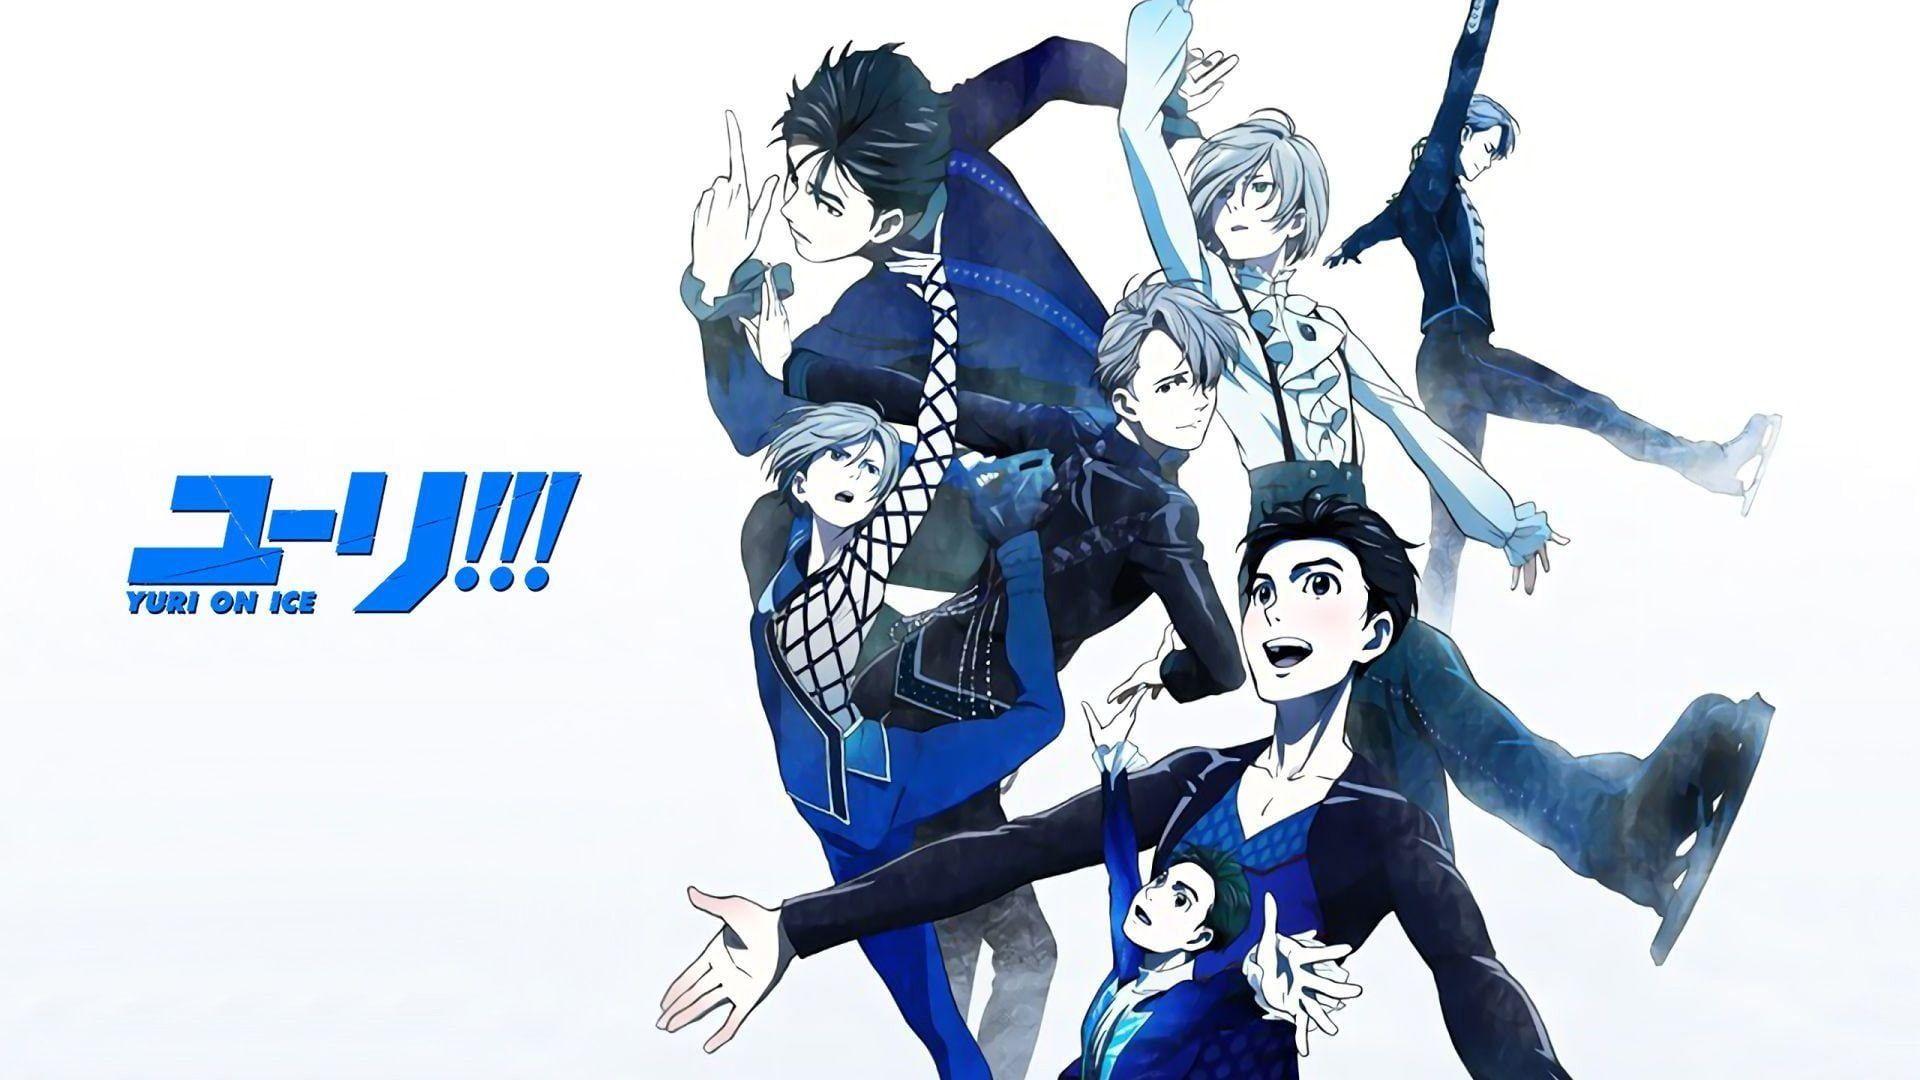 HD wallpaper: Anime, Yuri!!! on Ice, Viktor Nikiforov, Yuri Plisetsky, Yuuri Katsuki